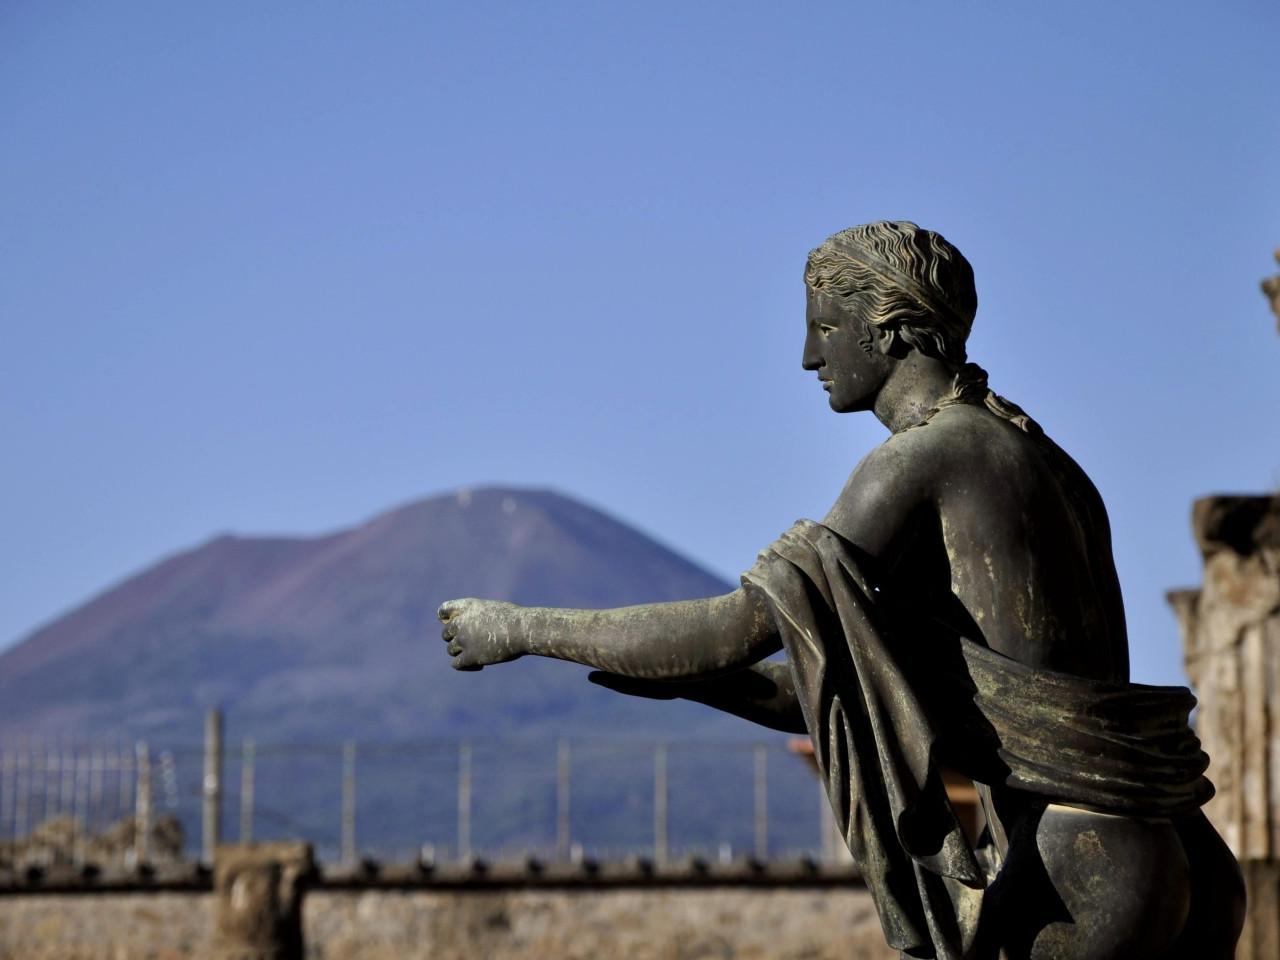 Pompeii archaeological shore excursion from Sorrento - Tiberius